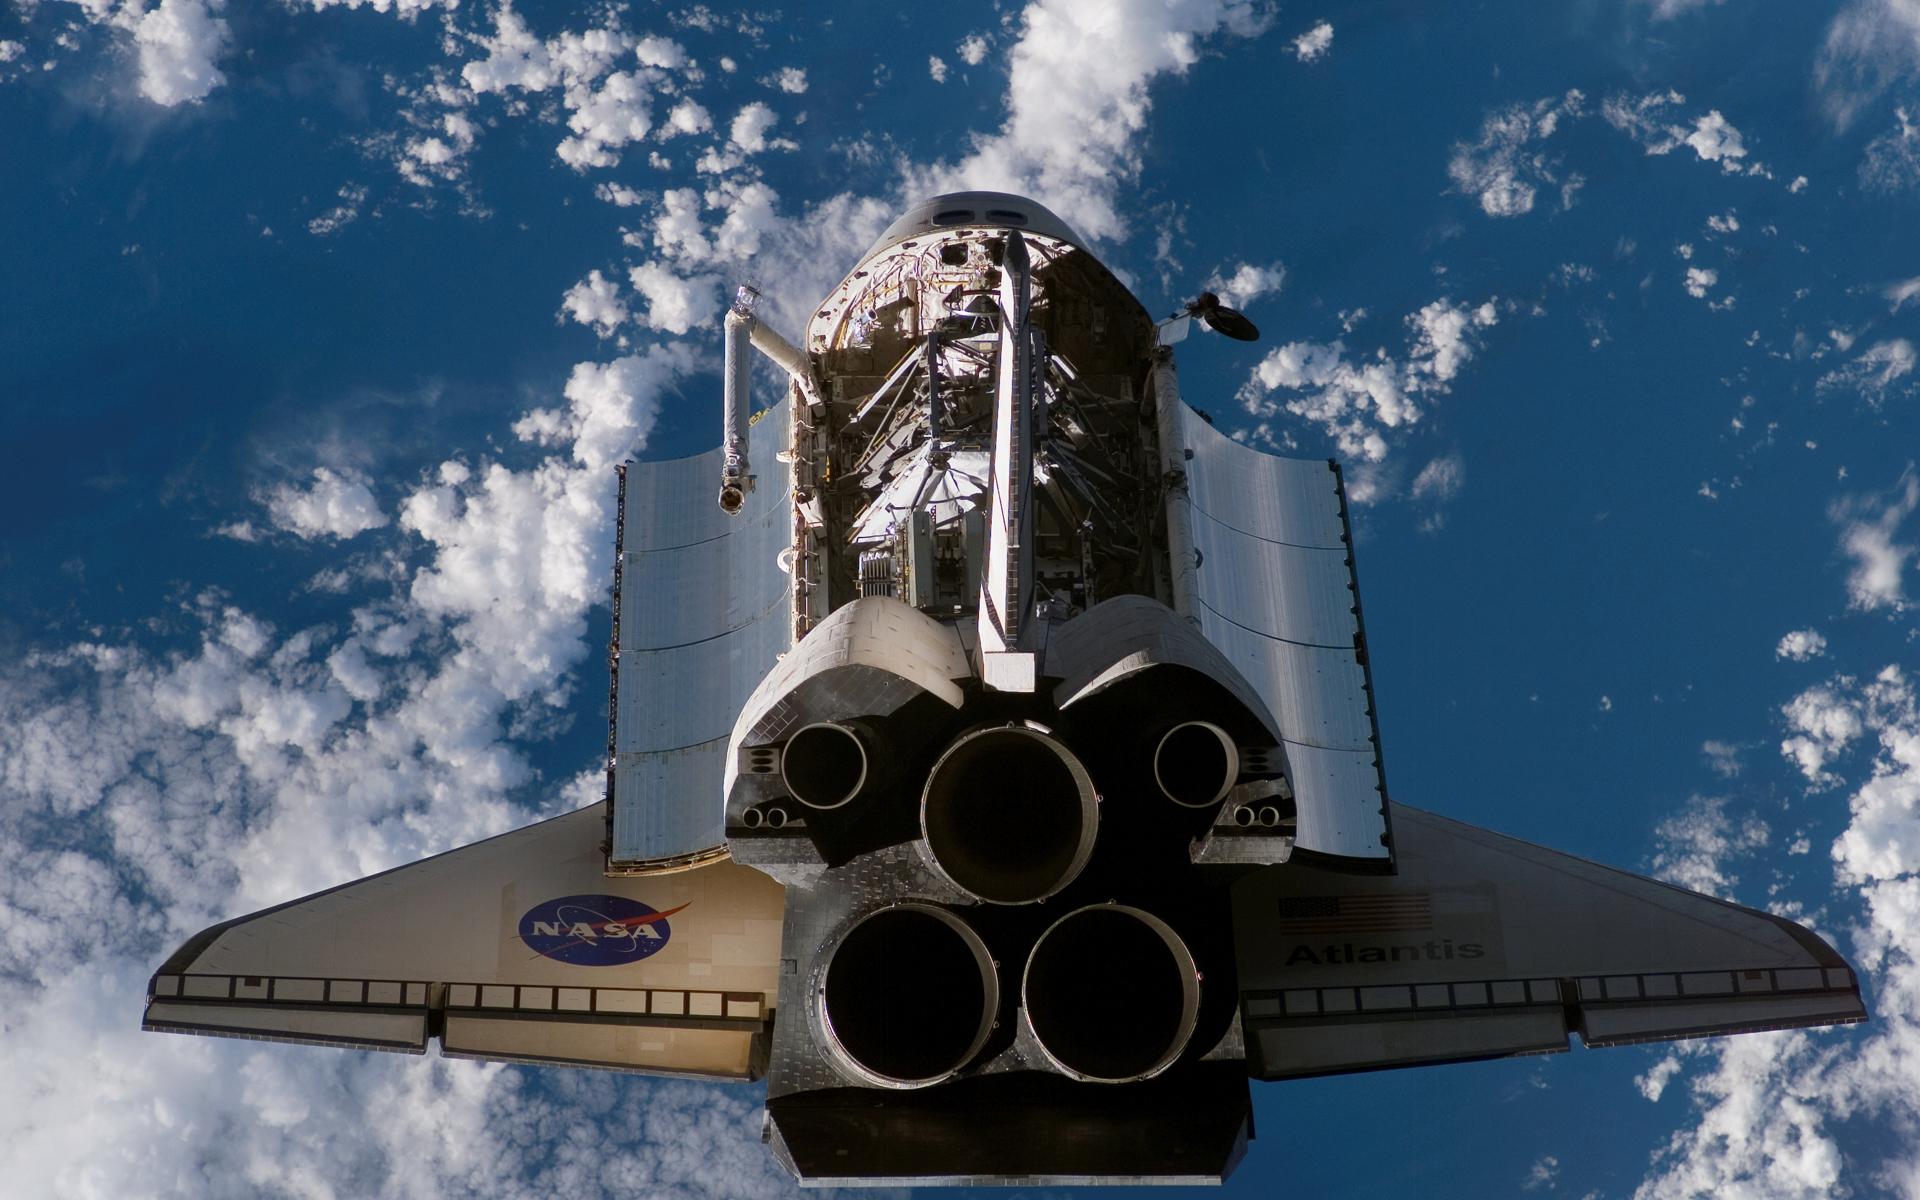 space shuttle habitable volume - photo #18